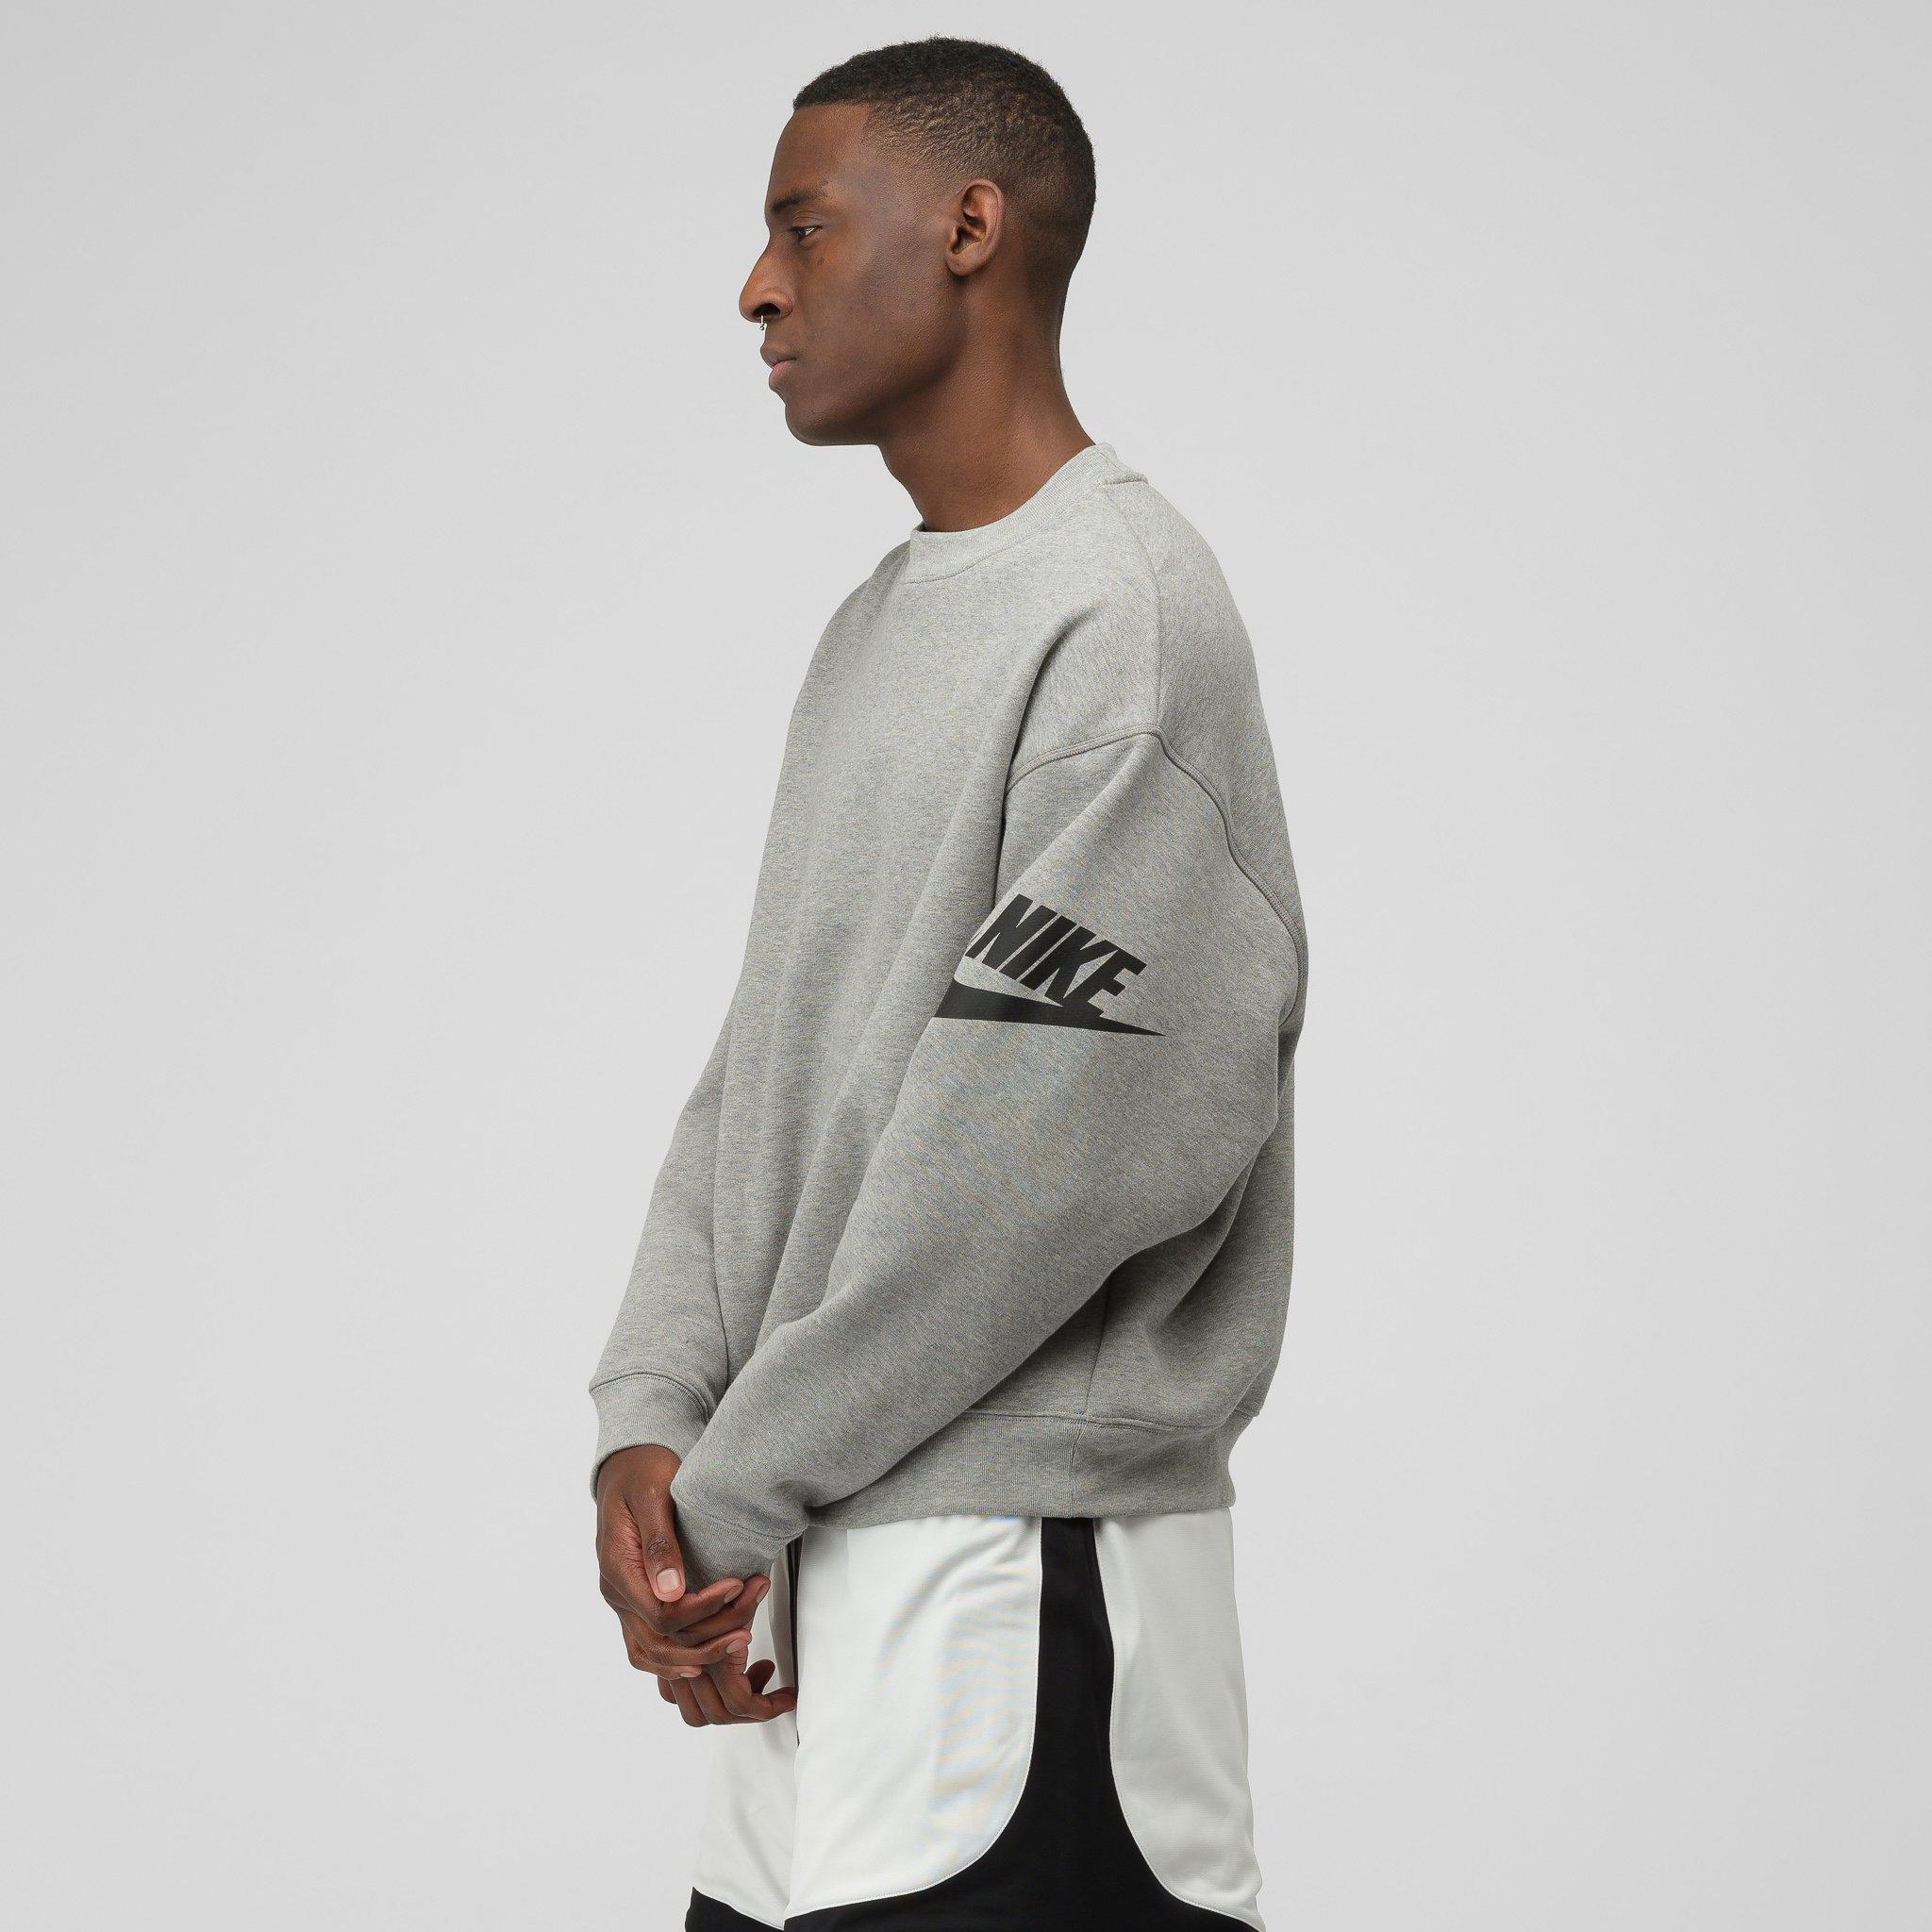 Nike Cotton X Fear Of God Crewneck